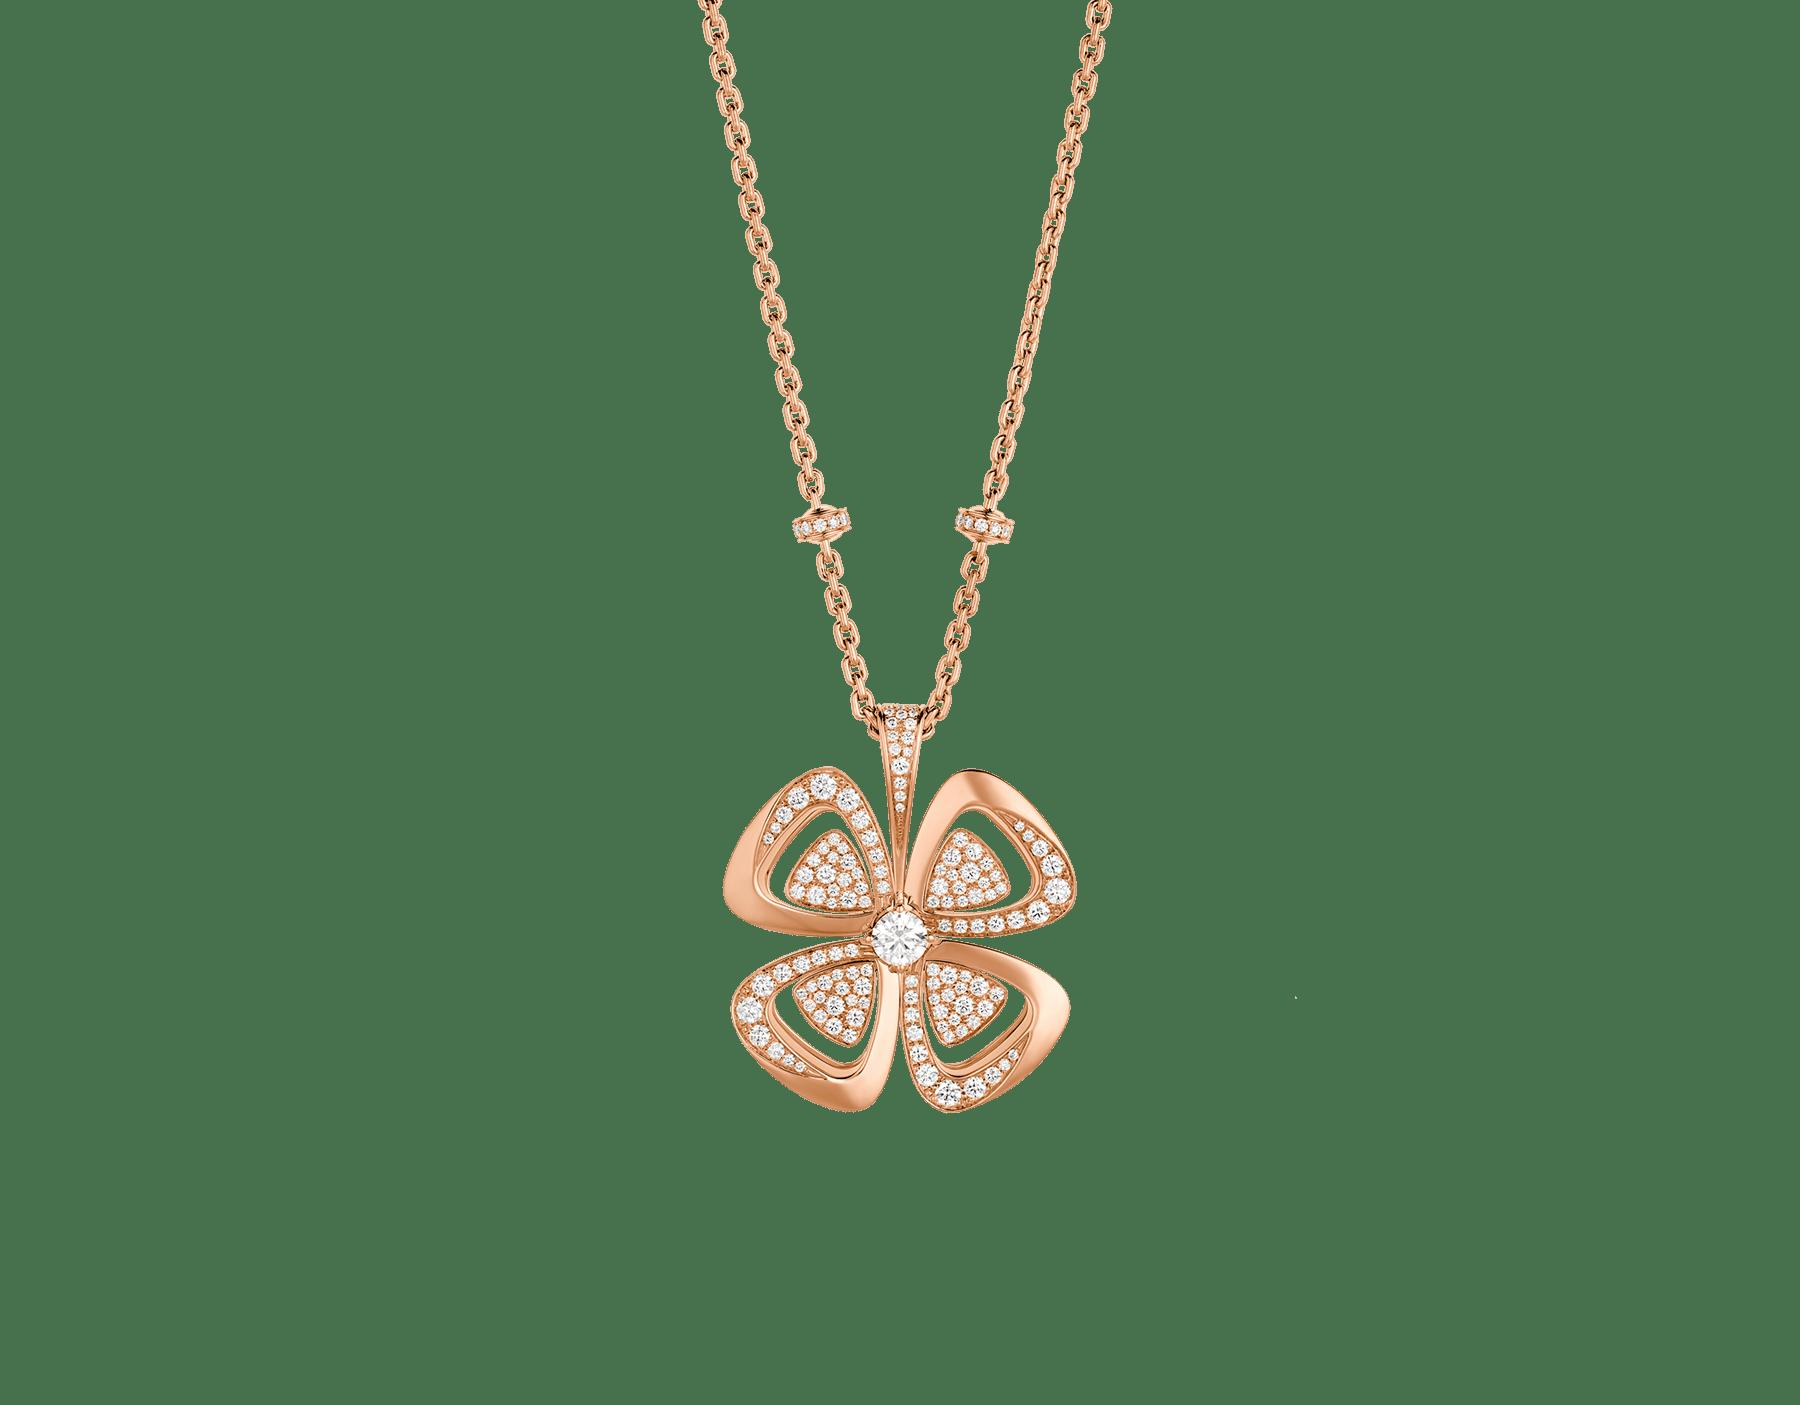 Collar Fiorever en oro rosa de 18qt con un diamante central redondo talla brillante y pavé de diamantes. 357218 image 1